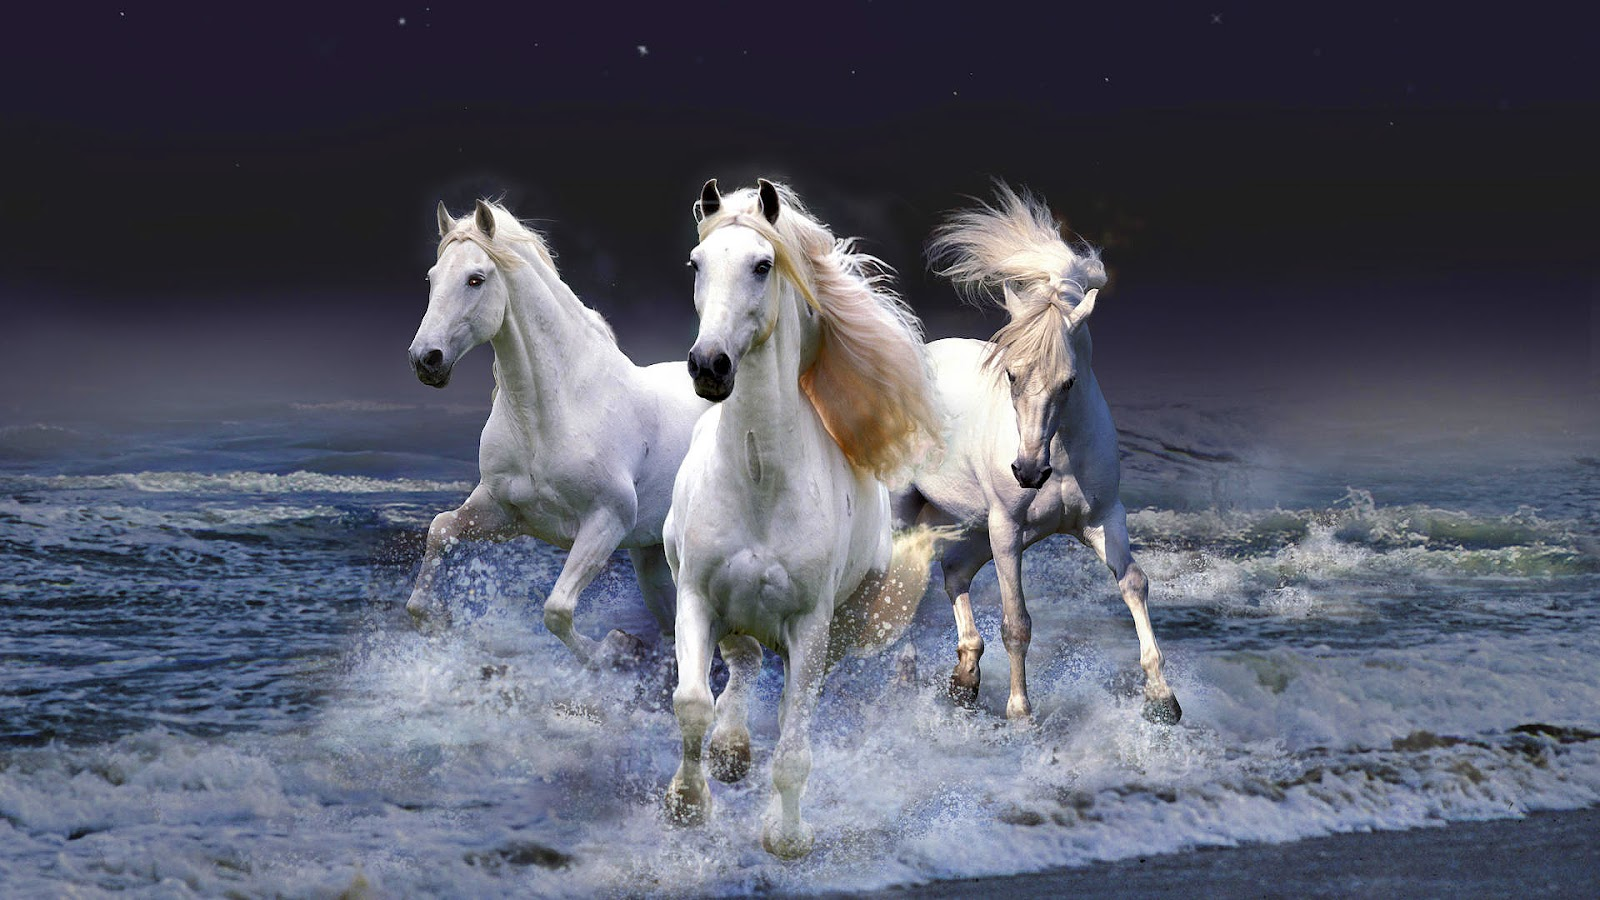 Running Horses Wallpaper Wallpapersafari